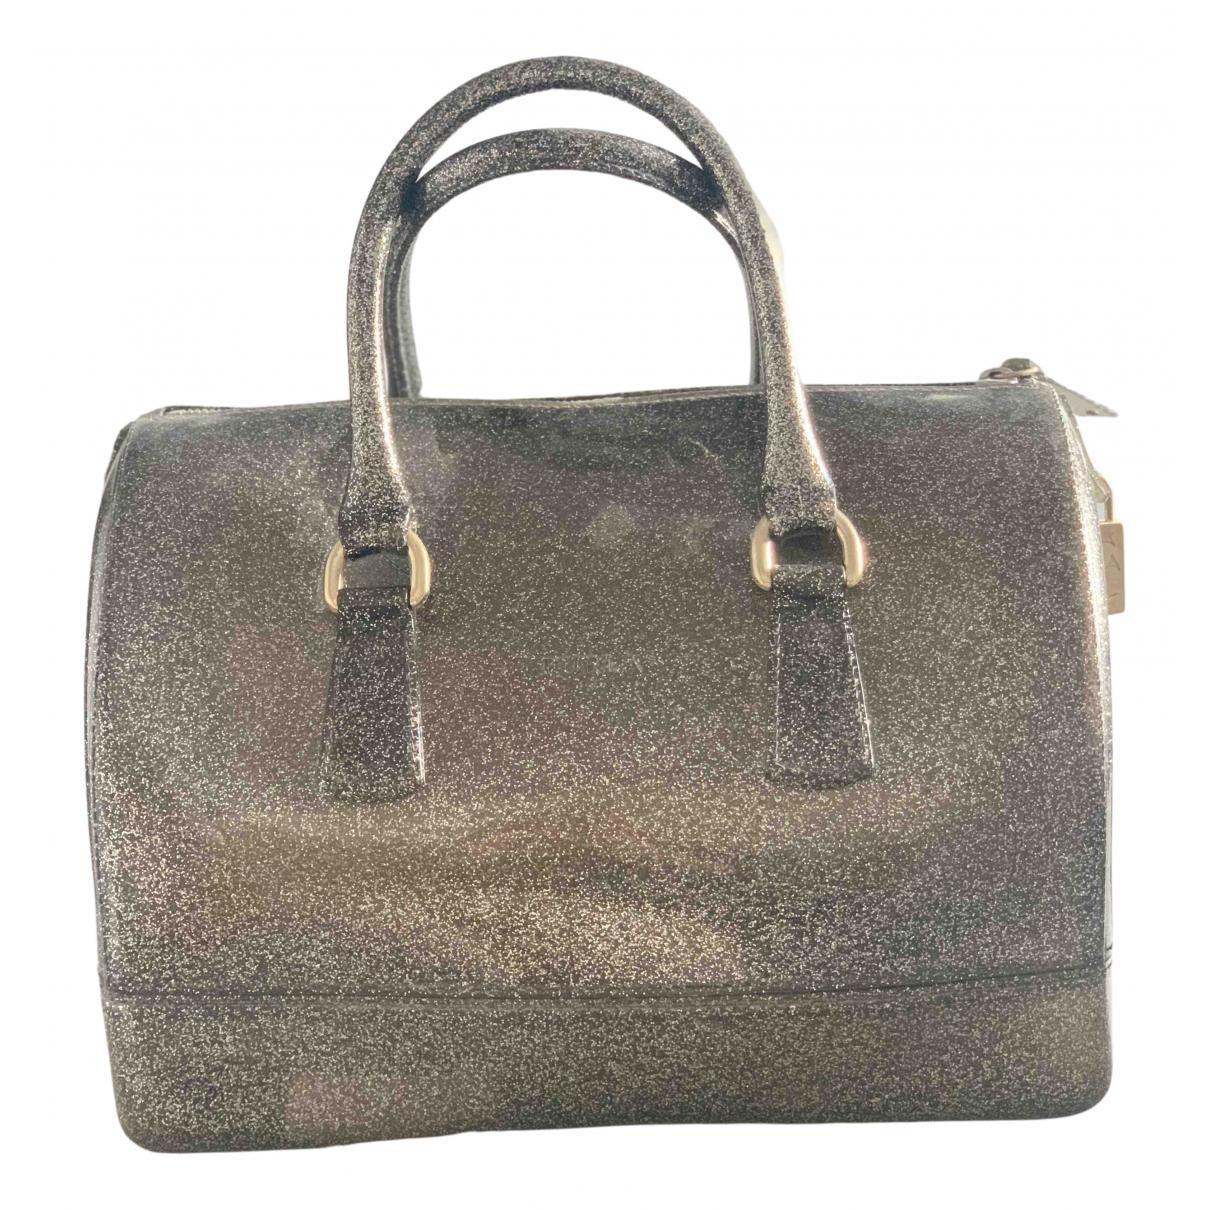 Furla Candy Bag Handtasche in  Grau Kunststoff